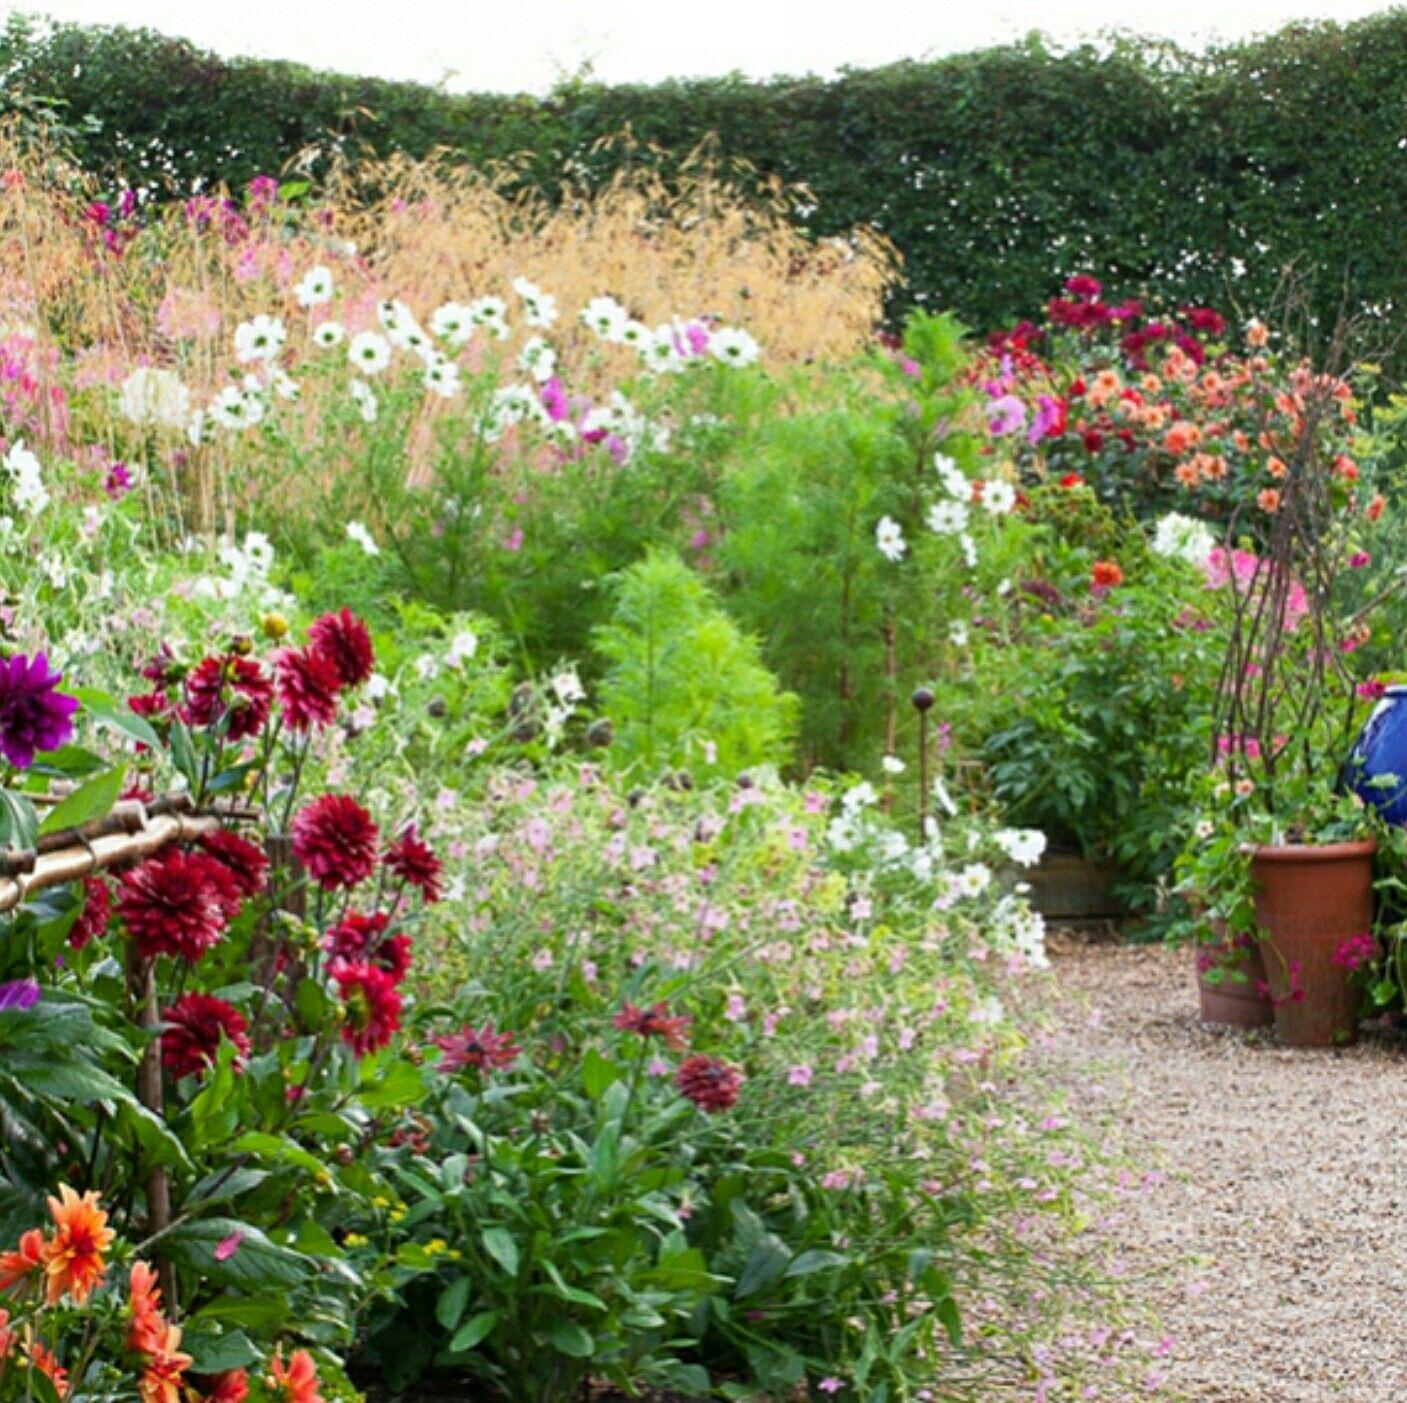 Cottage garden landscape design ideas  Sarah Raven  potager  Pinterest  Ravens Gardens and Flowers